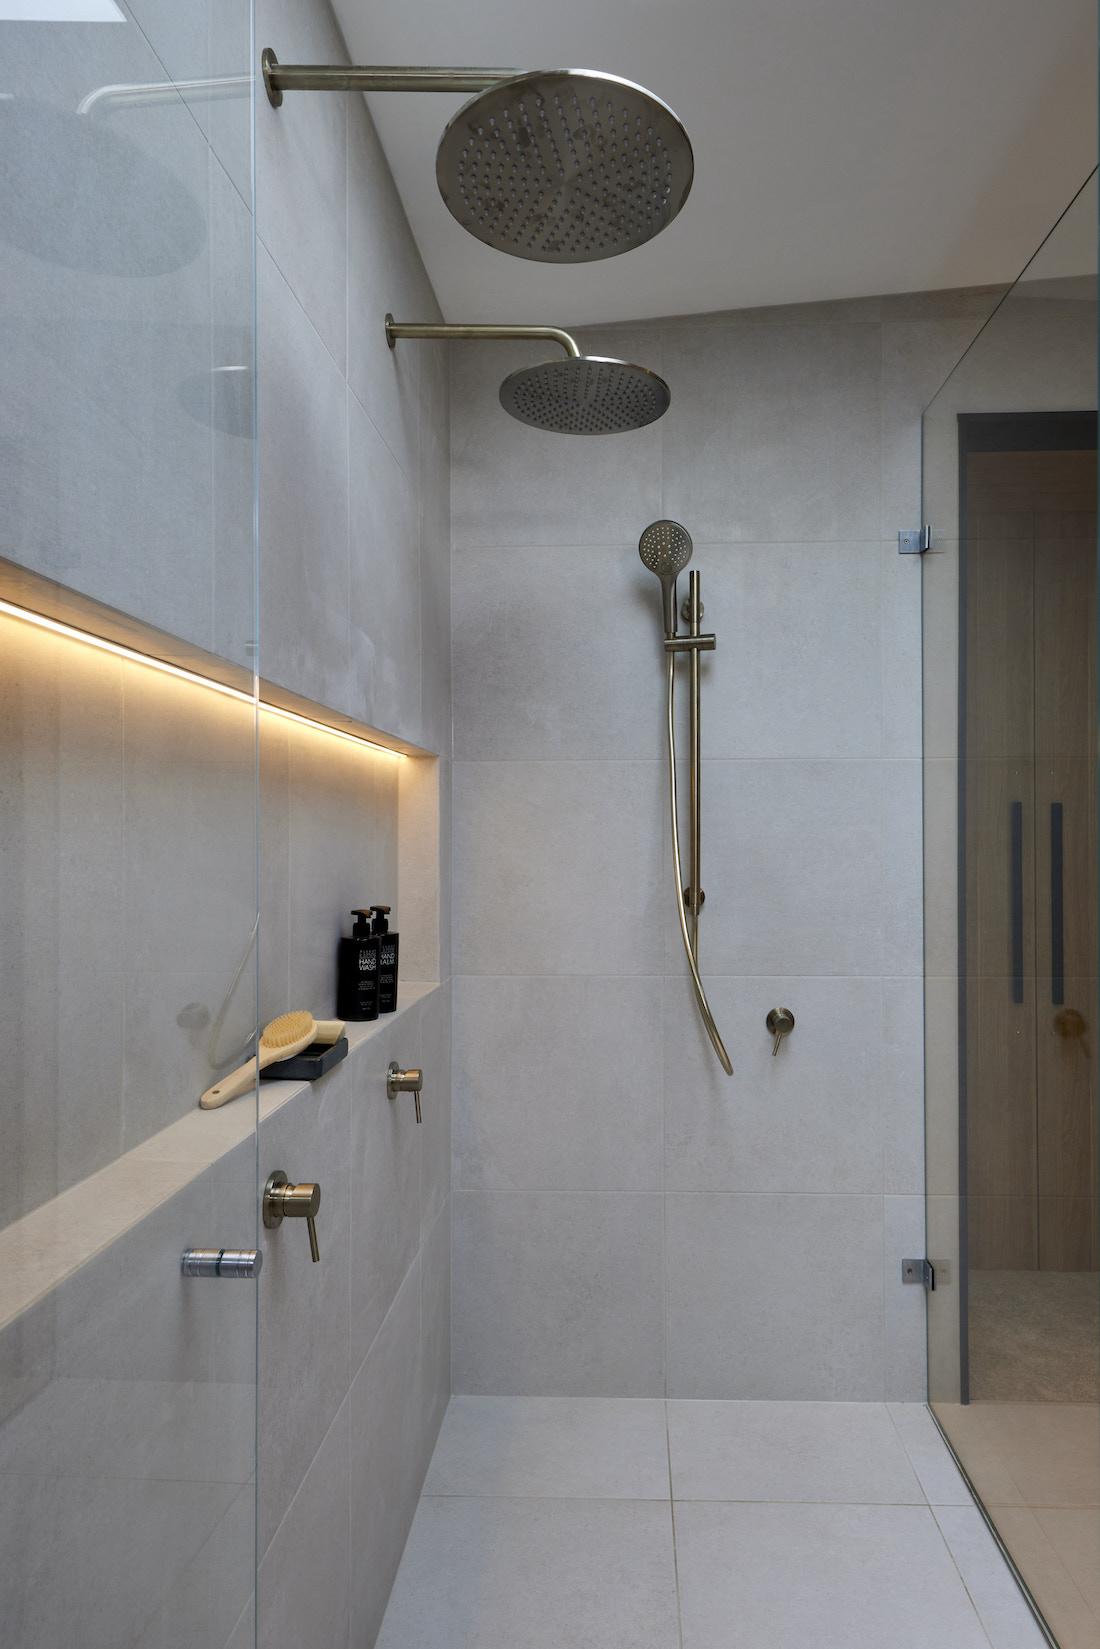 Light in shower niche in dual shower